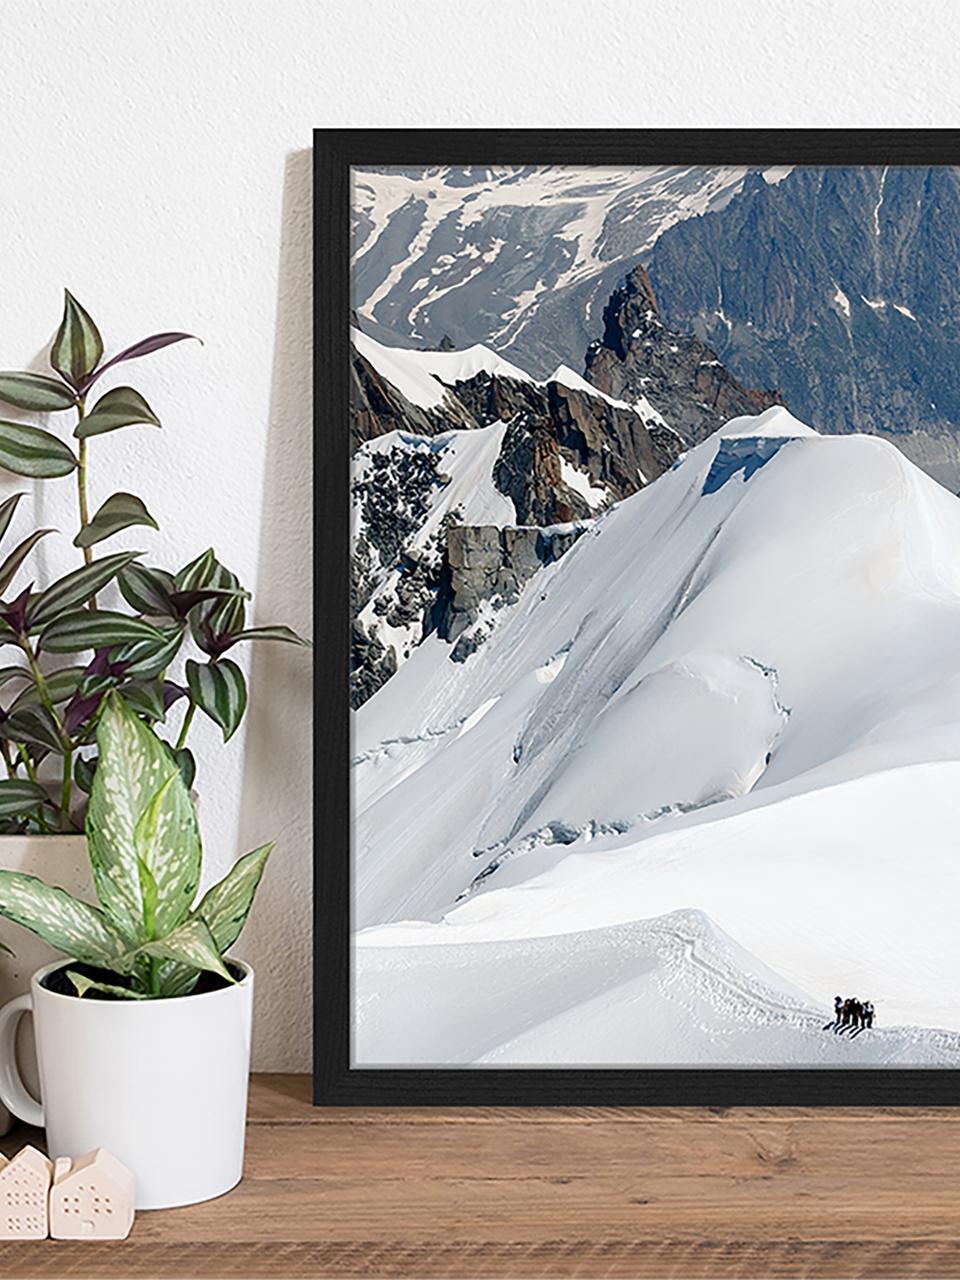 Gerahmter Digitaldruck The Ice Caps And Mountains., Bild: Digitaldruck auf Papier, , Rahmen: Holz, lackiert, Front: Plexiglas, Mehrfarbig, 43 x 53 cm